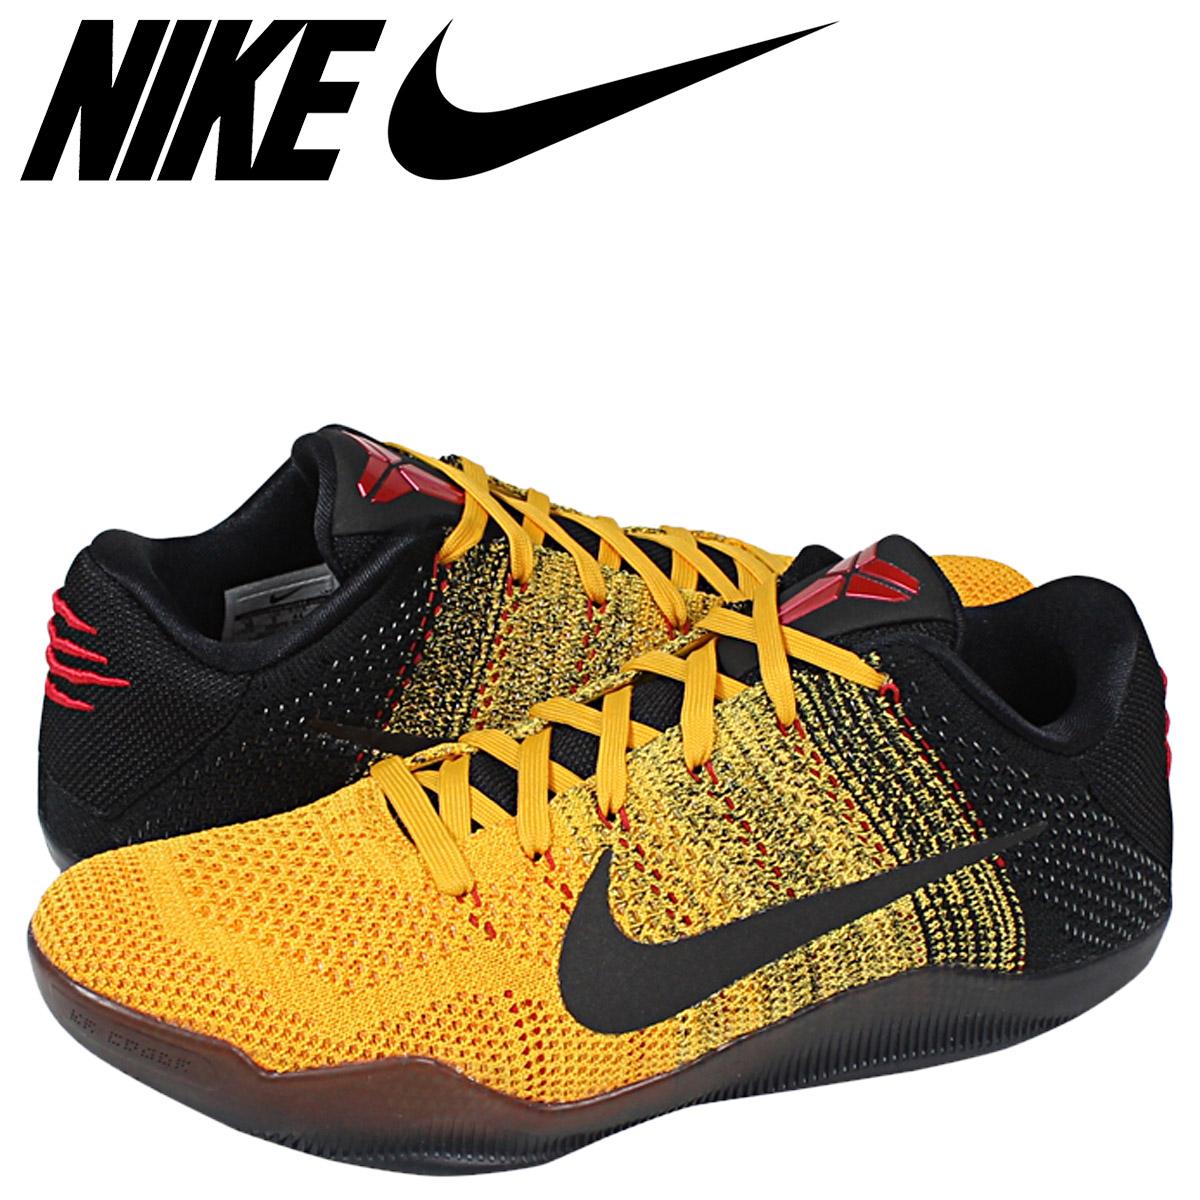 79a7c5d70785 Sugar Online Shop   SOLD OUT  Nike NIKE Kobe sneakers KOBE XI ELITE ...